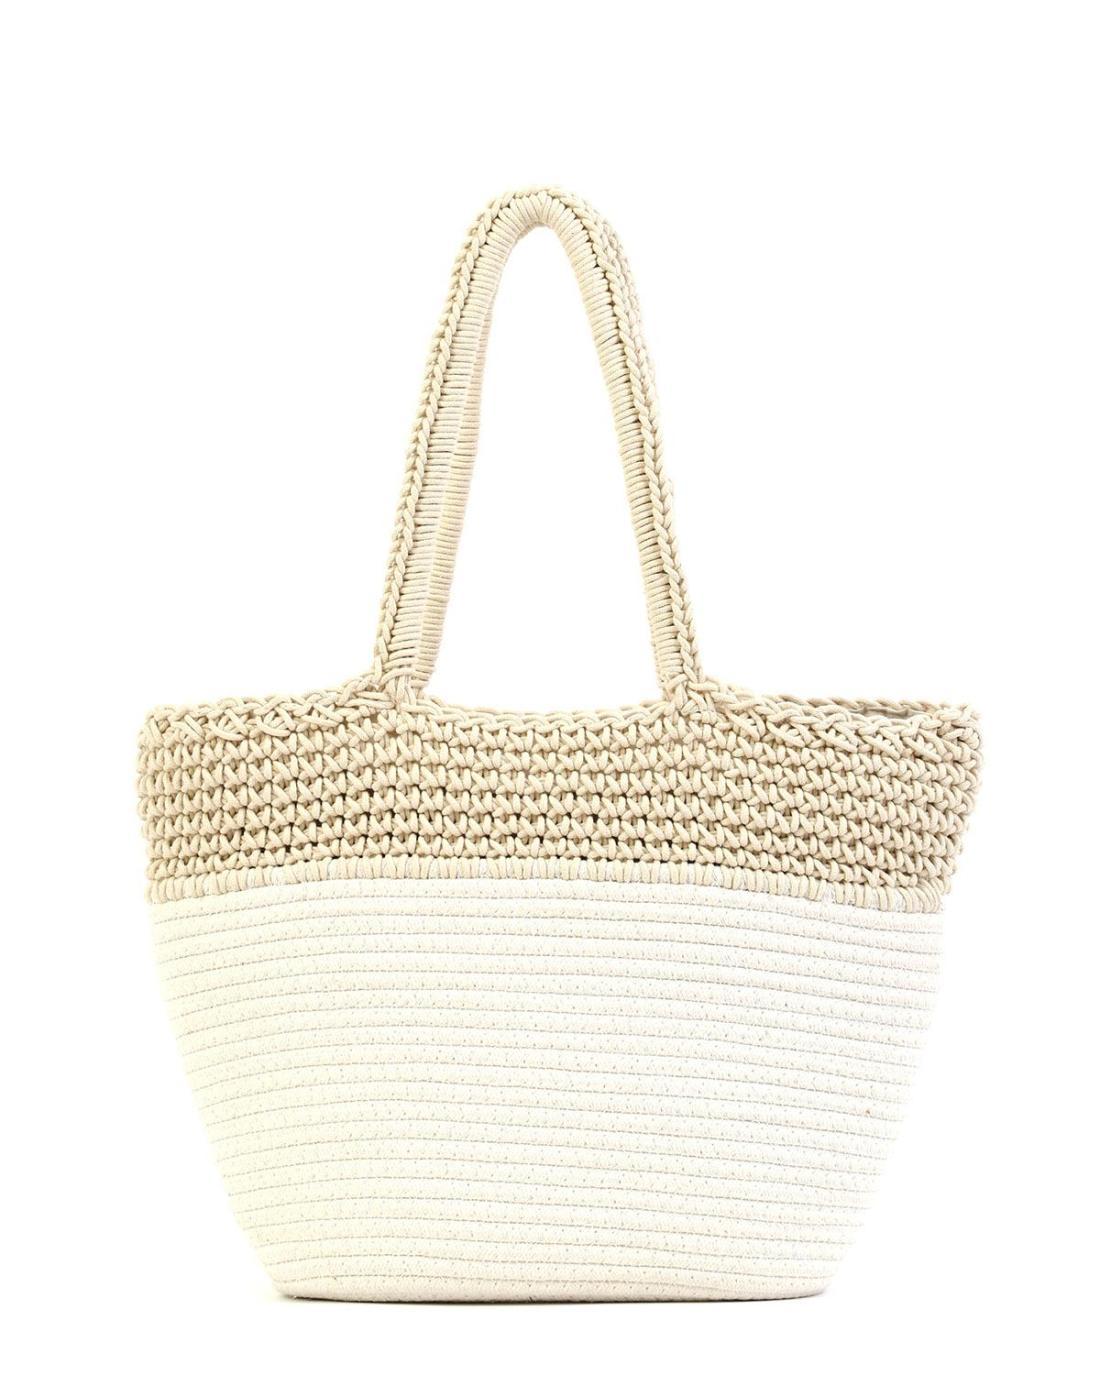 Paper straw white beach bag